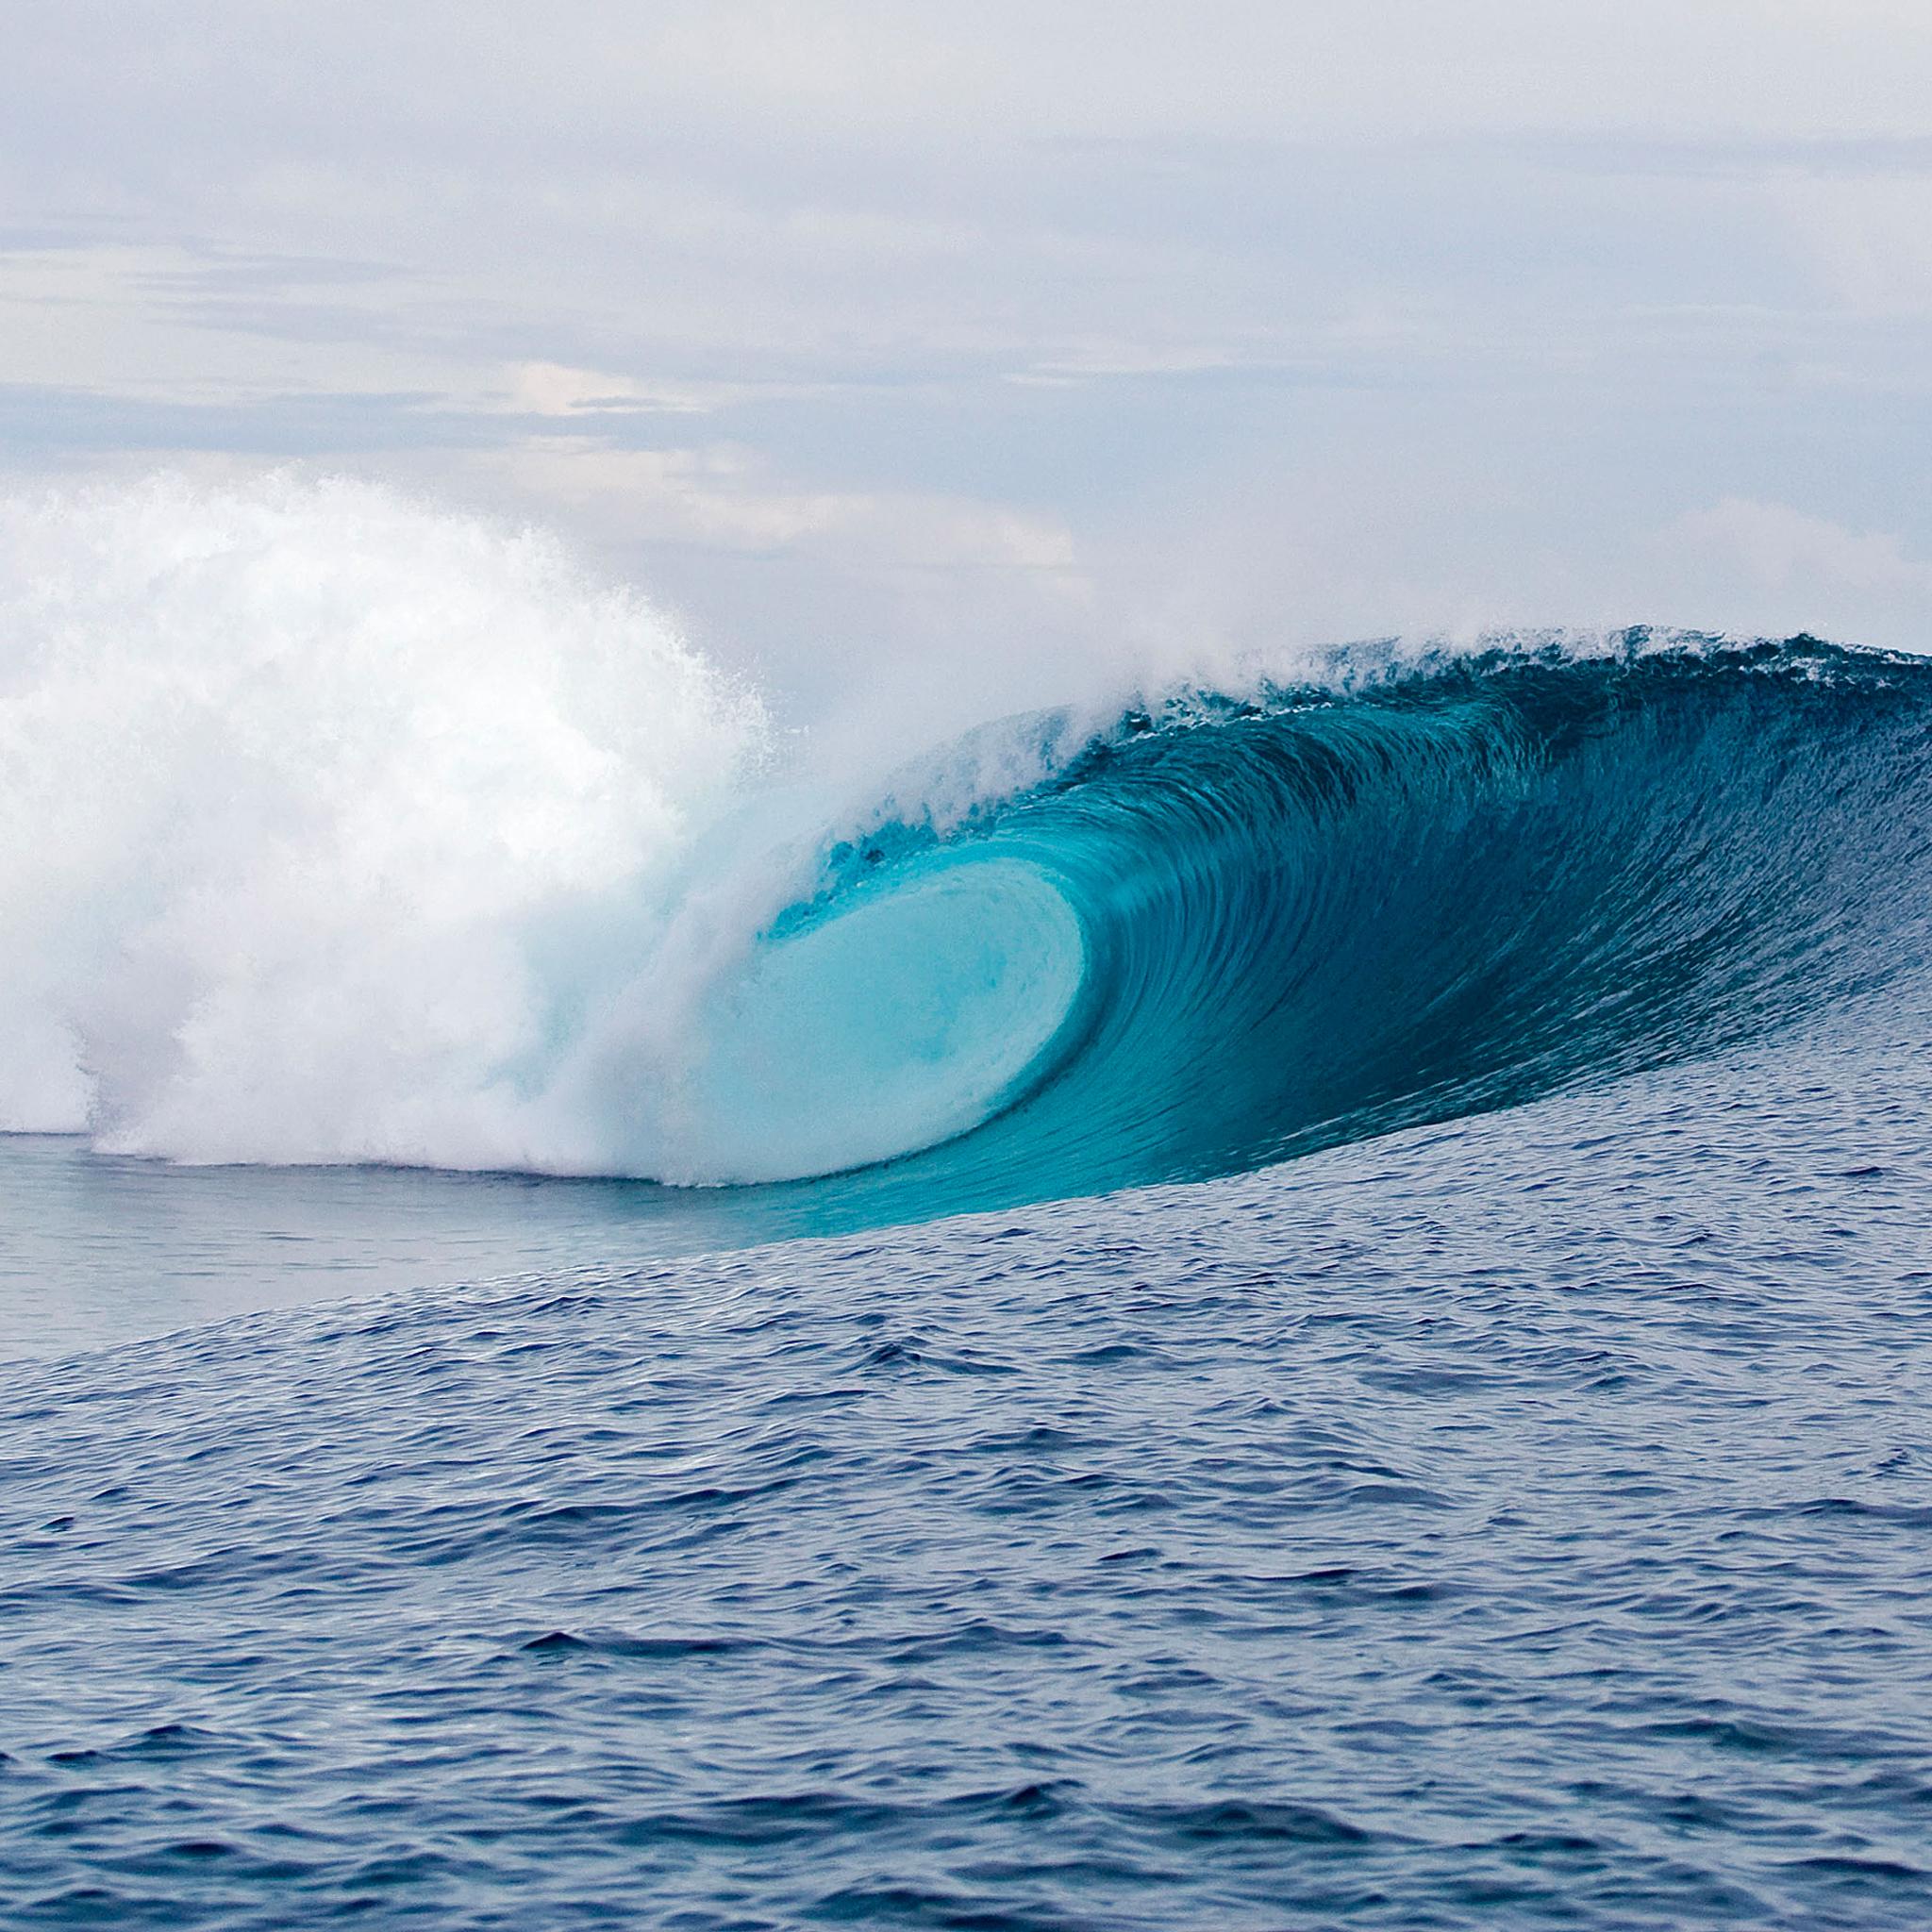 Surf Wallpaper Iphone X Teahupoo Ipad Wallpaper For Iphone X 8 7 6 Free